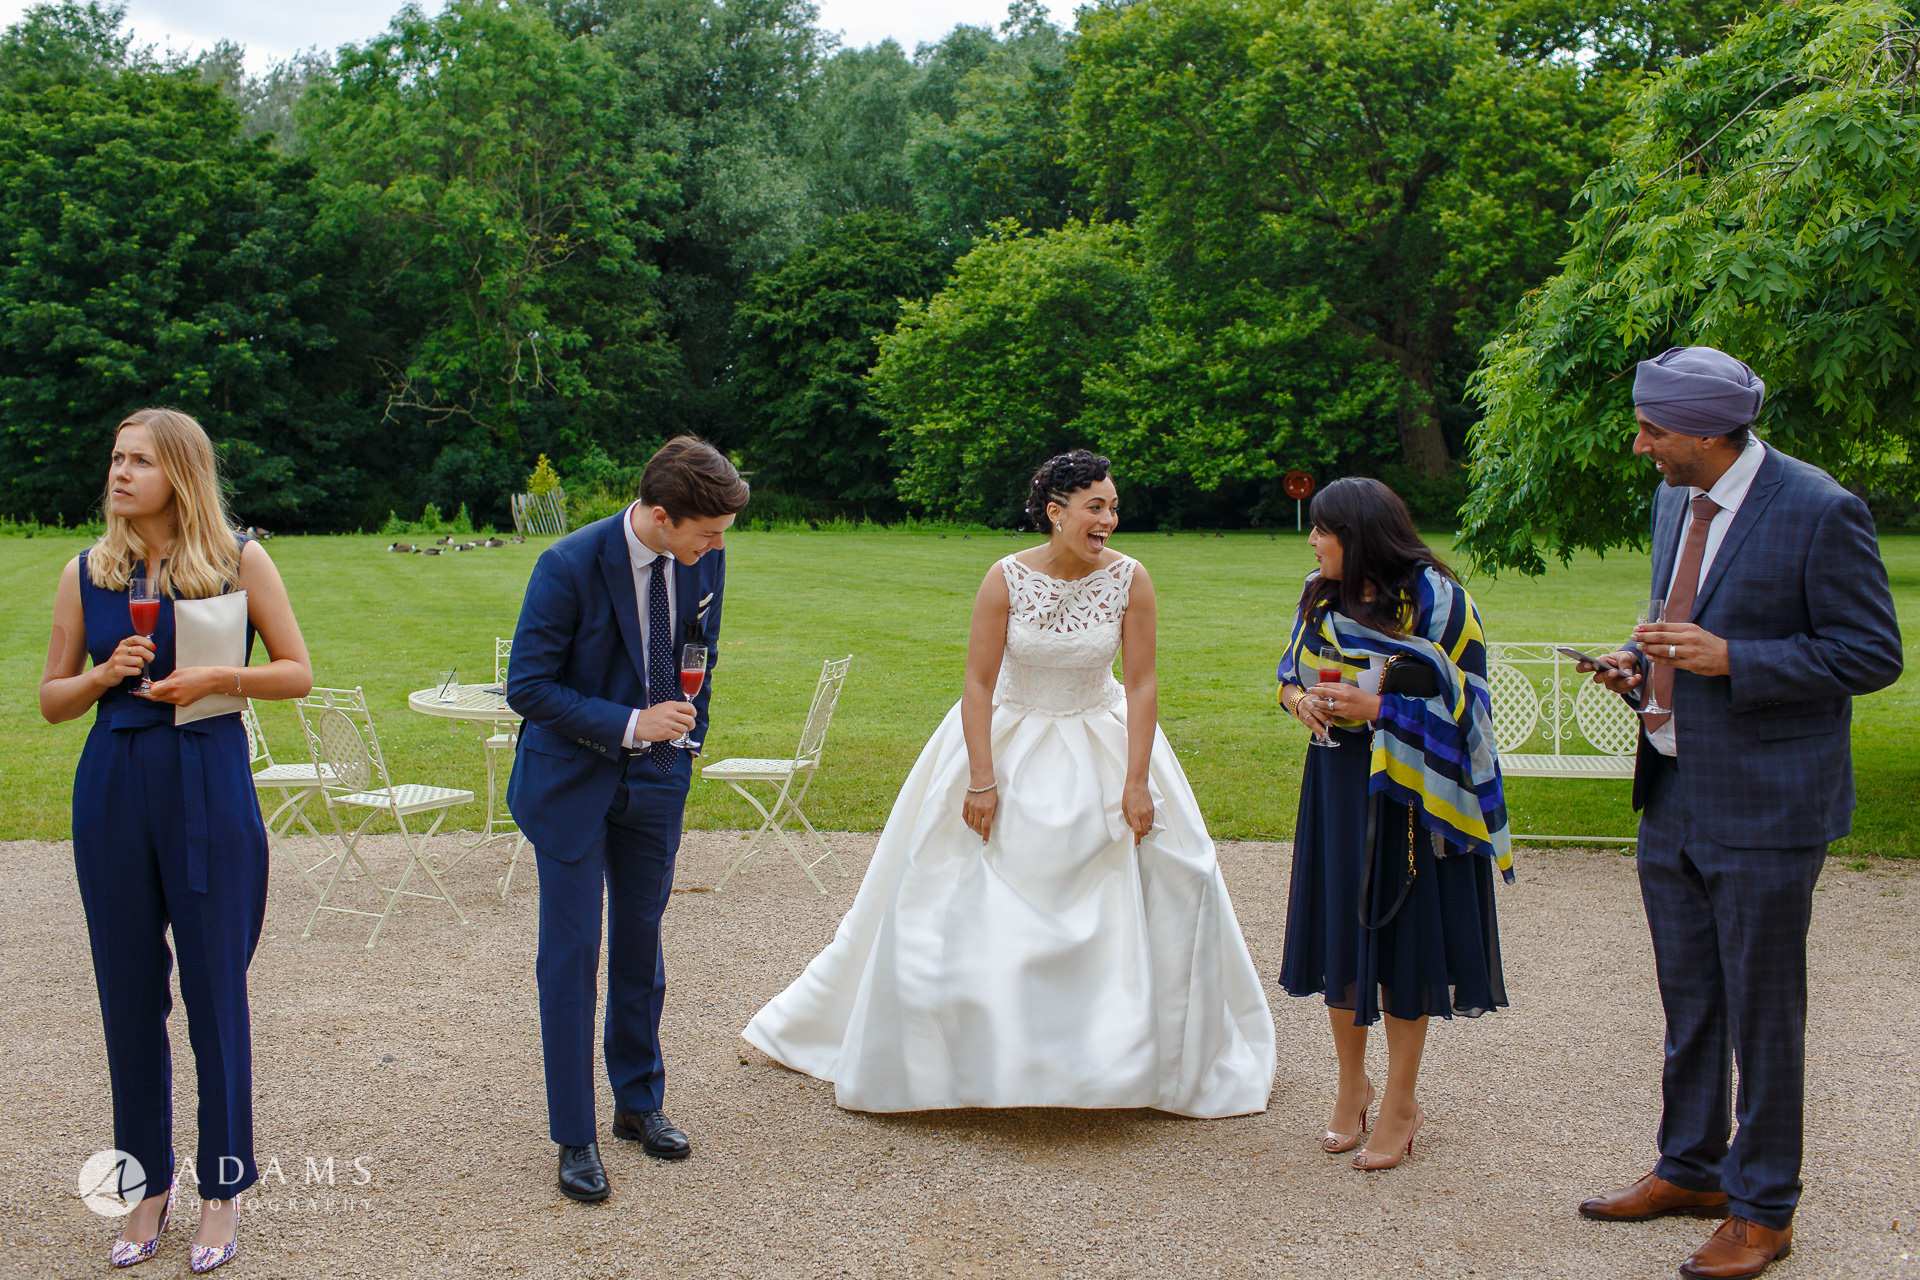 Morden HallWedding bride and groom in front of Morden Hall